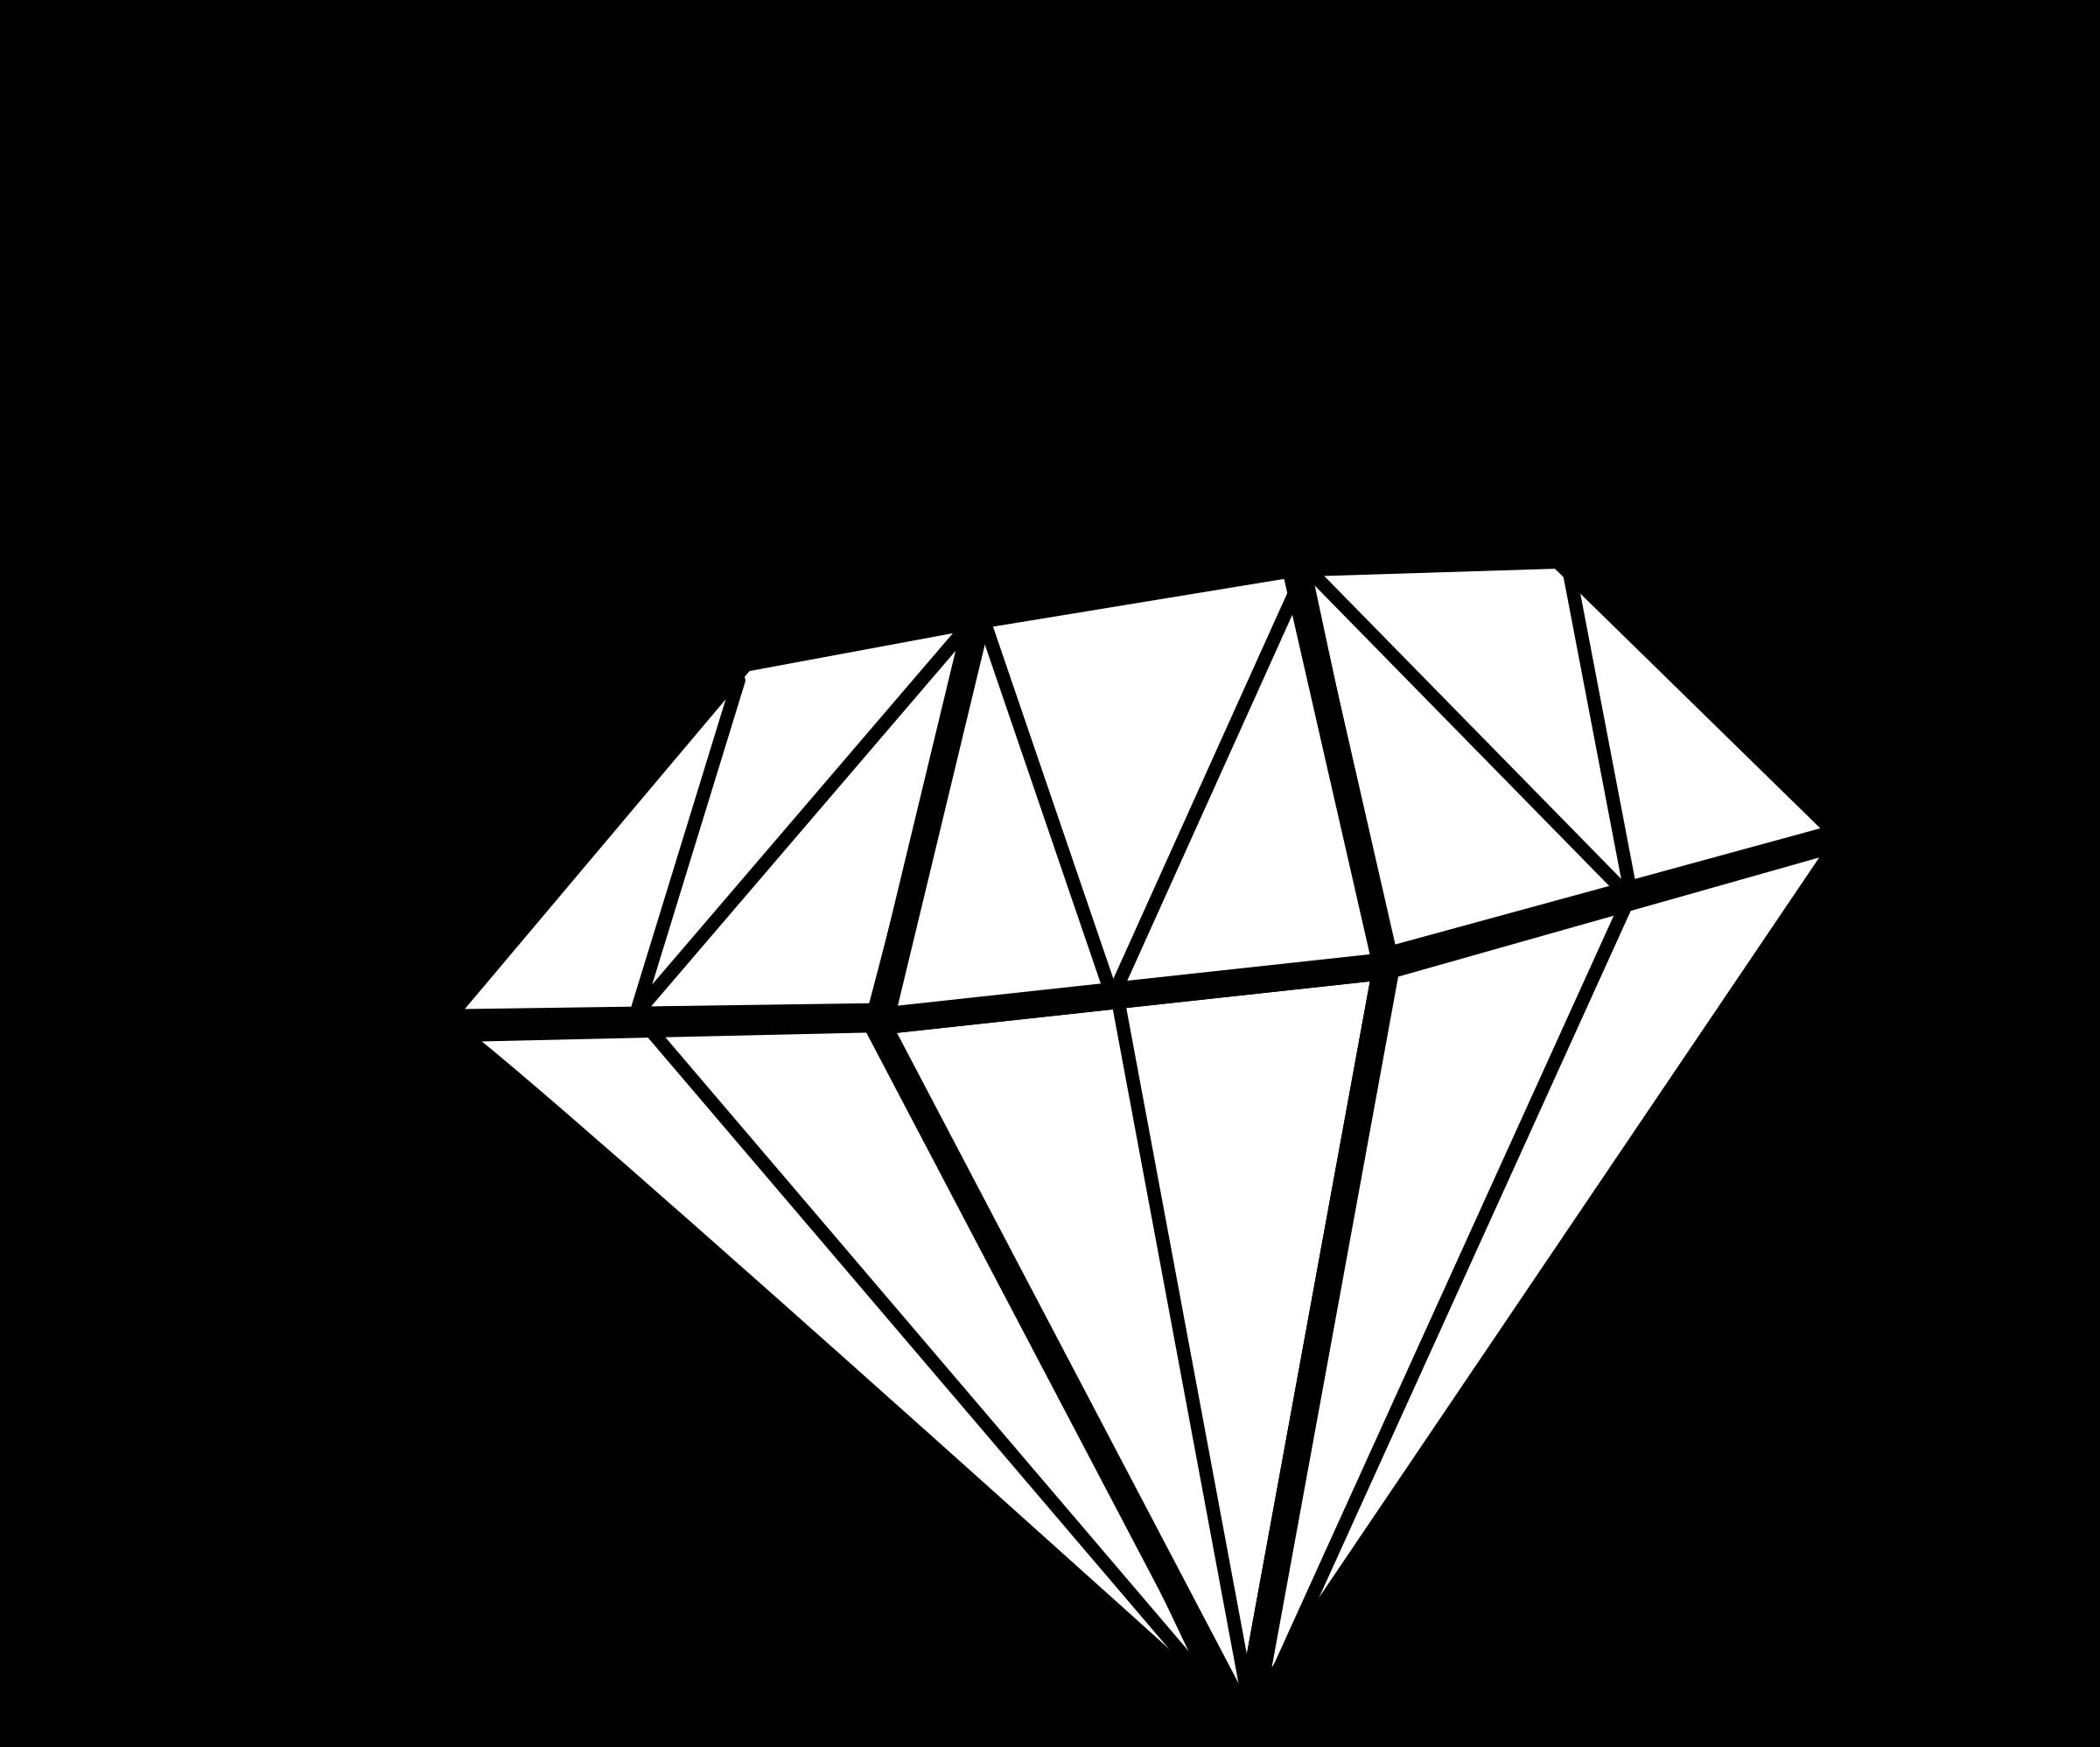 все картинки рисунок бриллианта того этот